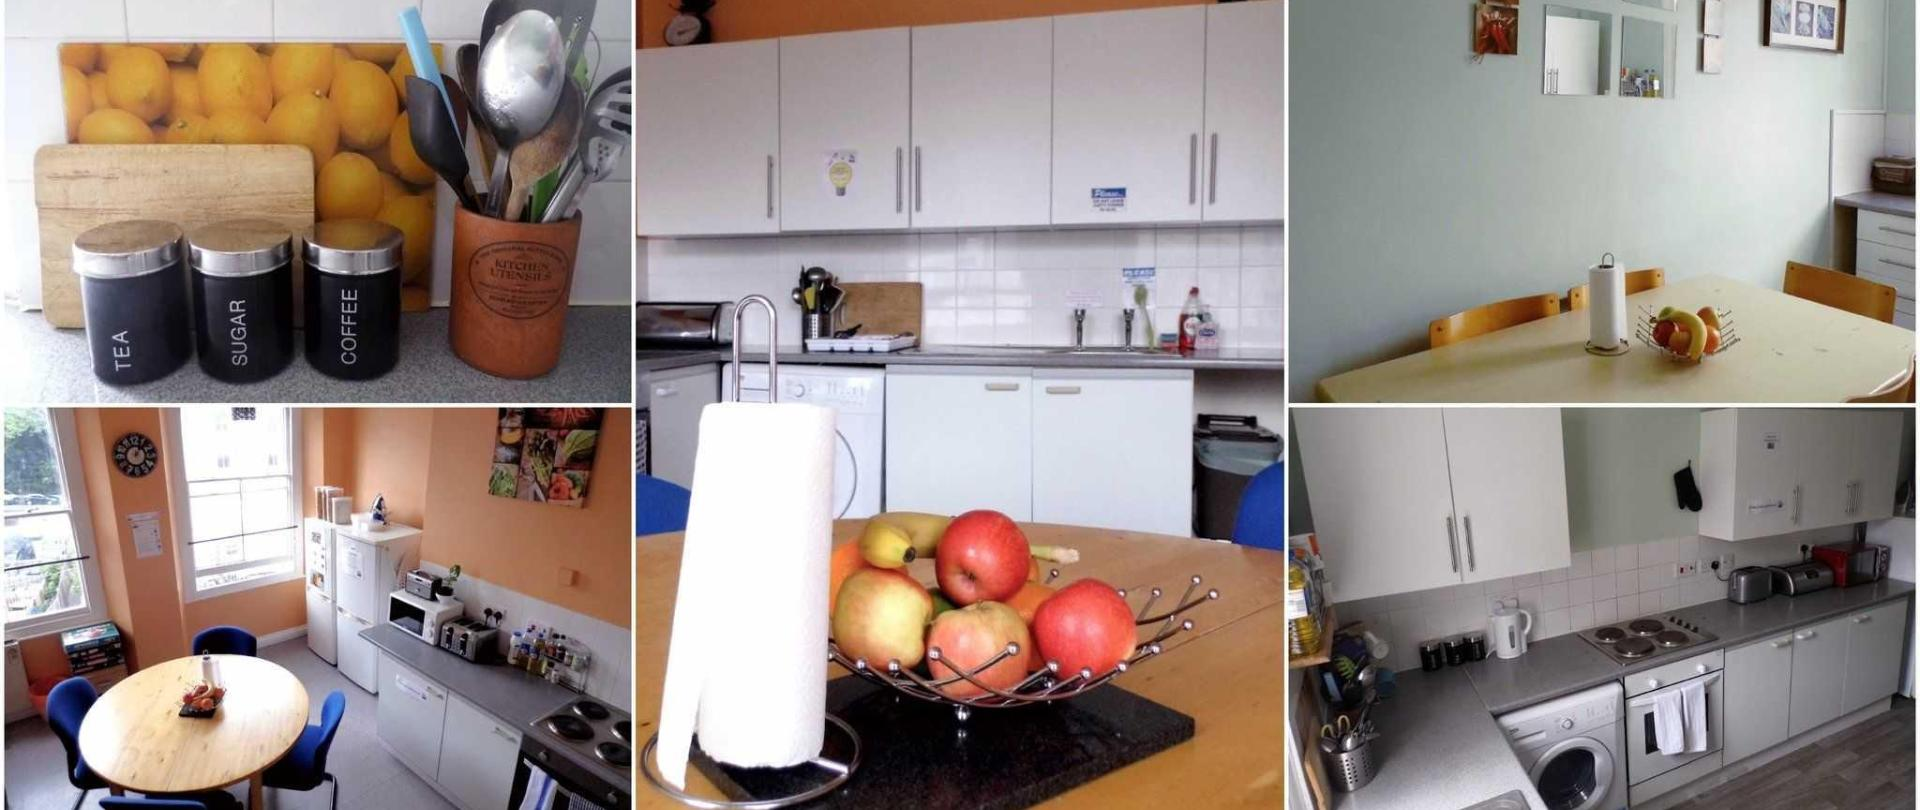 collage_fotor_kitchen_fotor.jpg